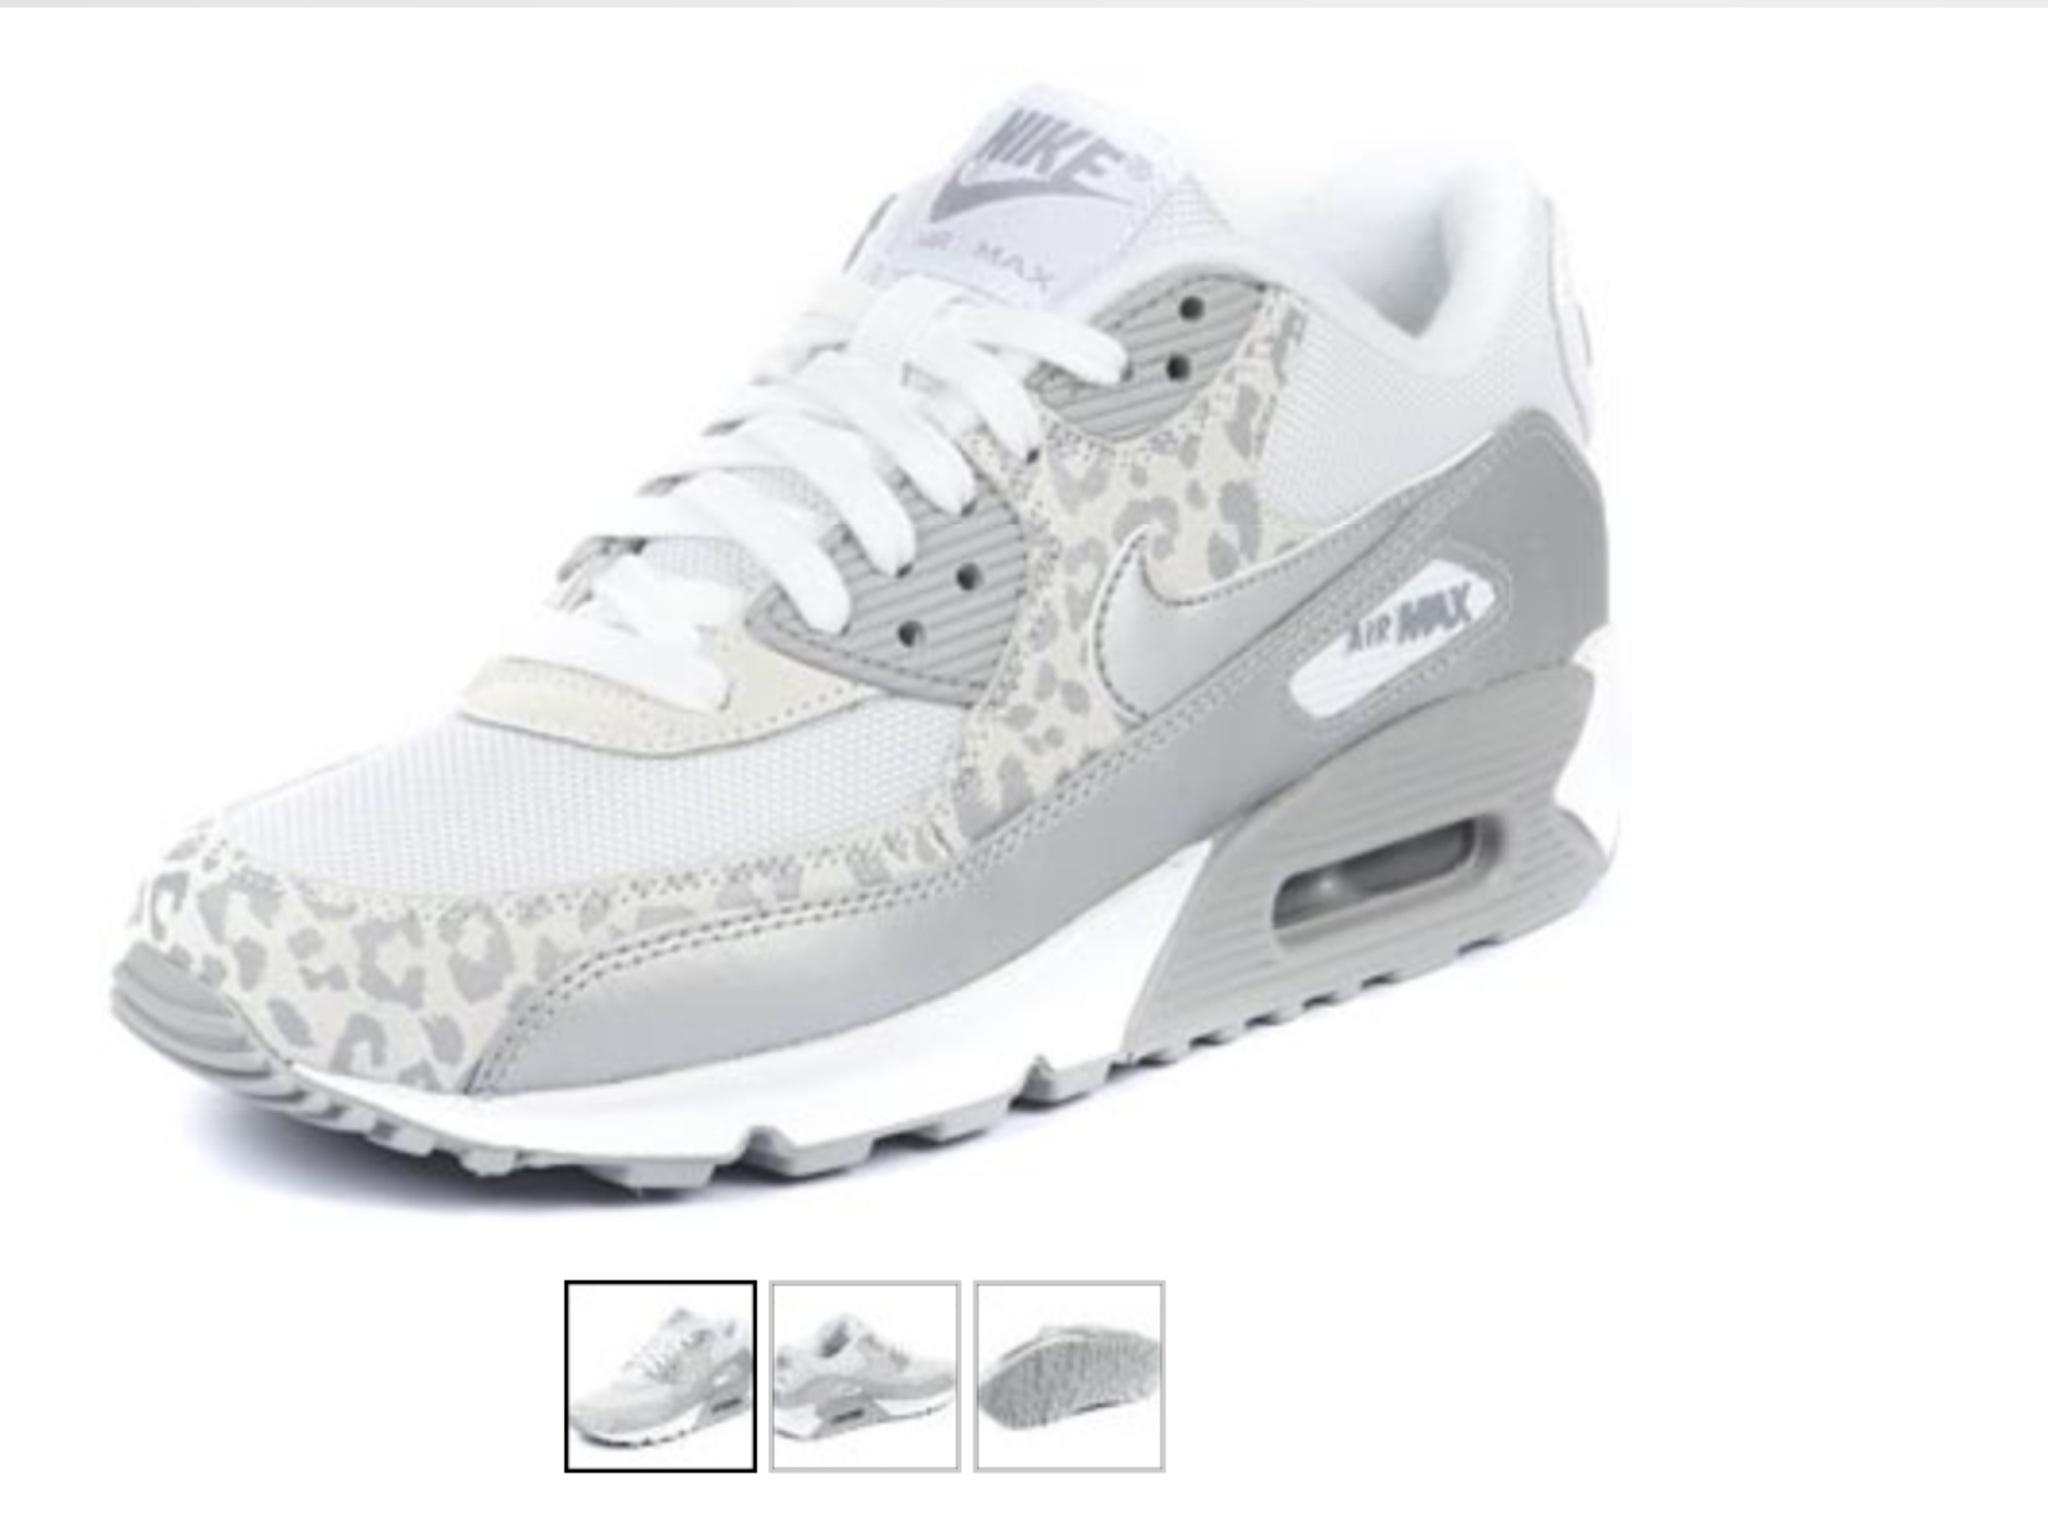 Nike schuhe quietschen